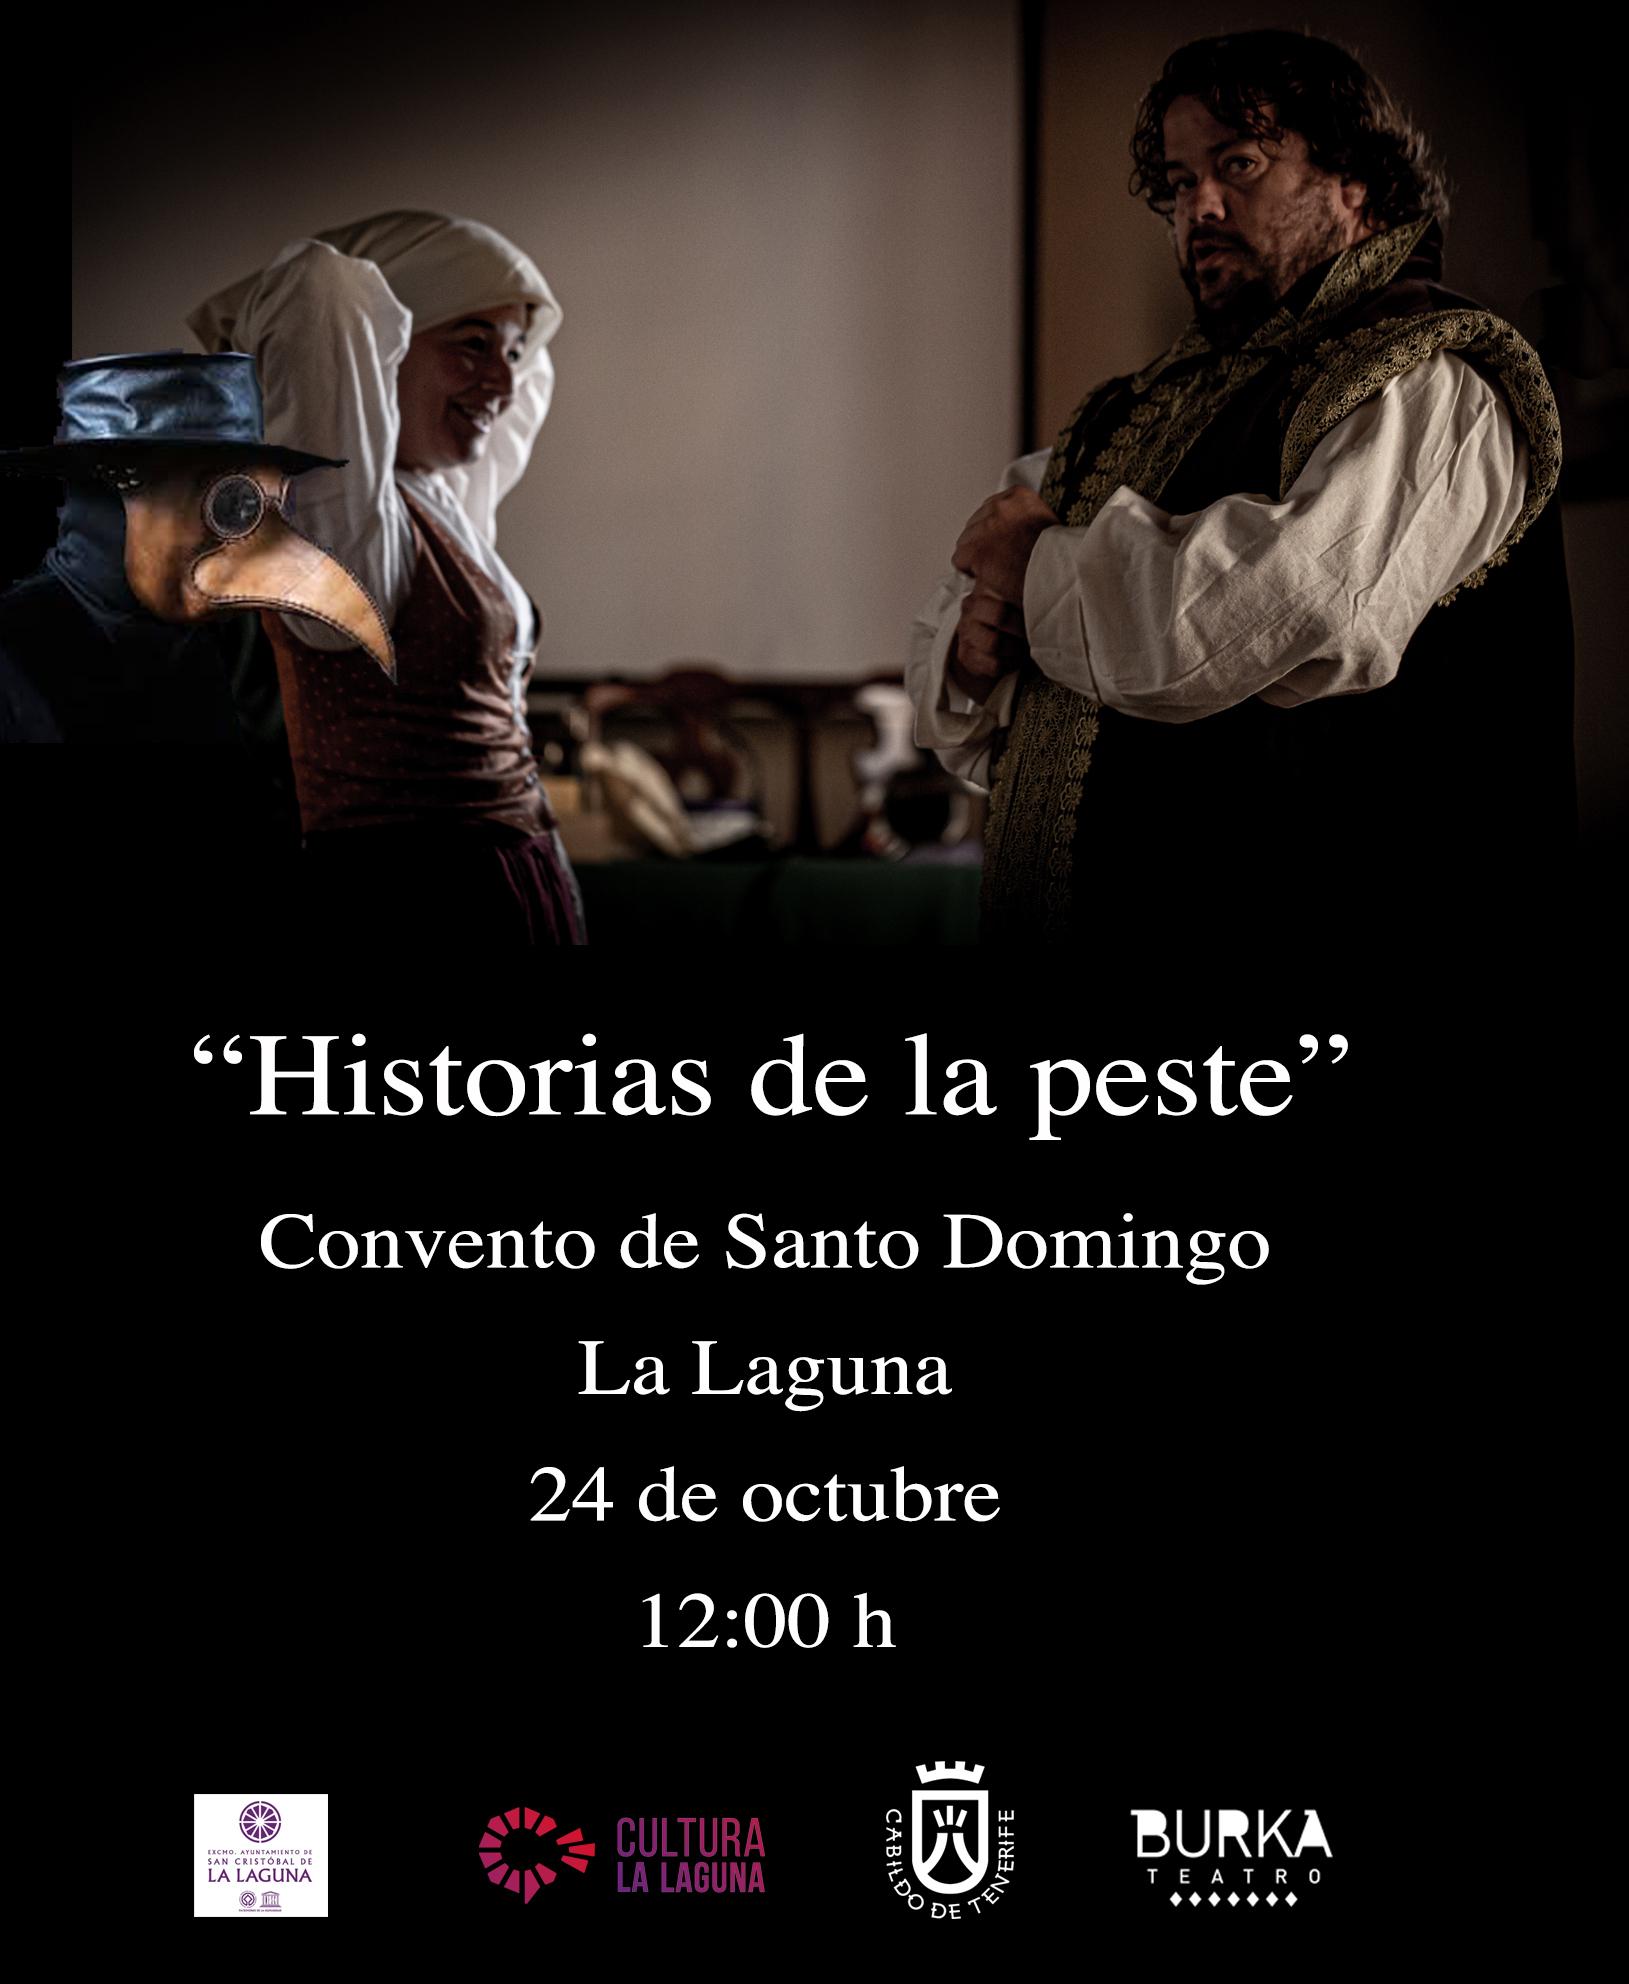 historia-de-la-peste-burka-teatro-61641e806ea5d7.35536439.jpeg